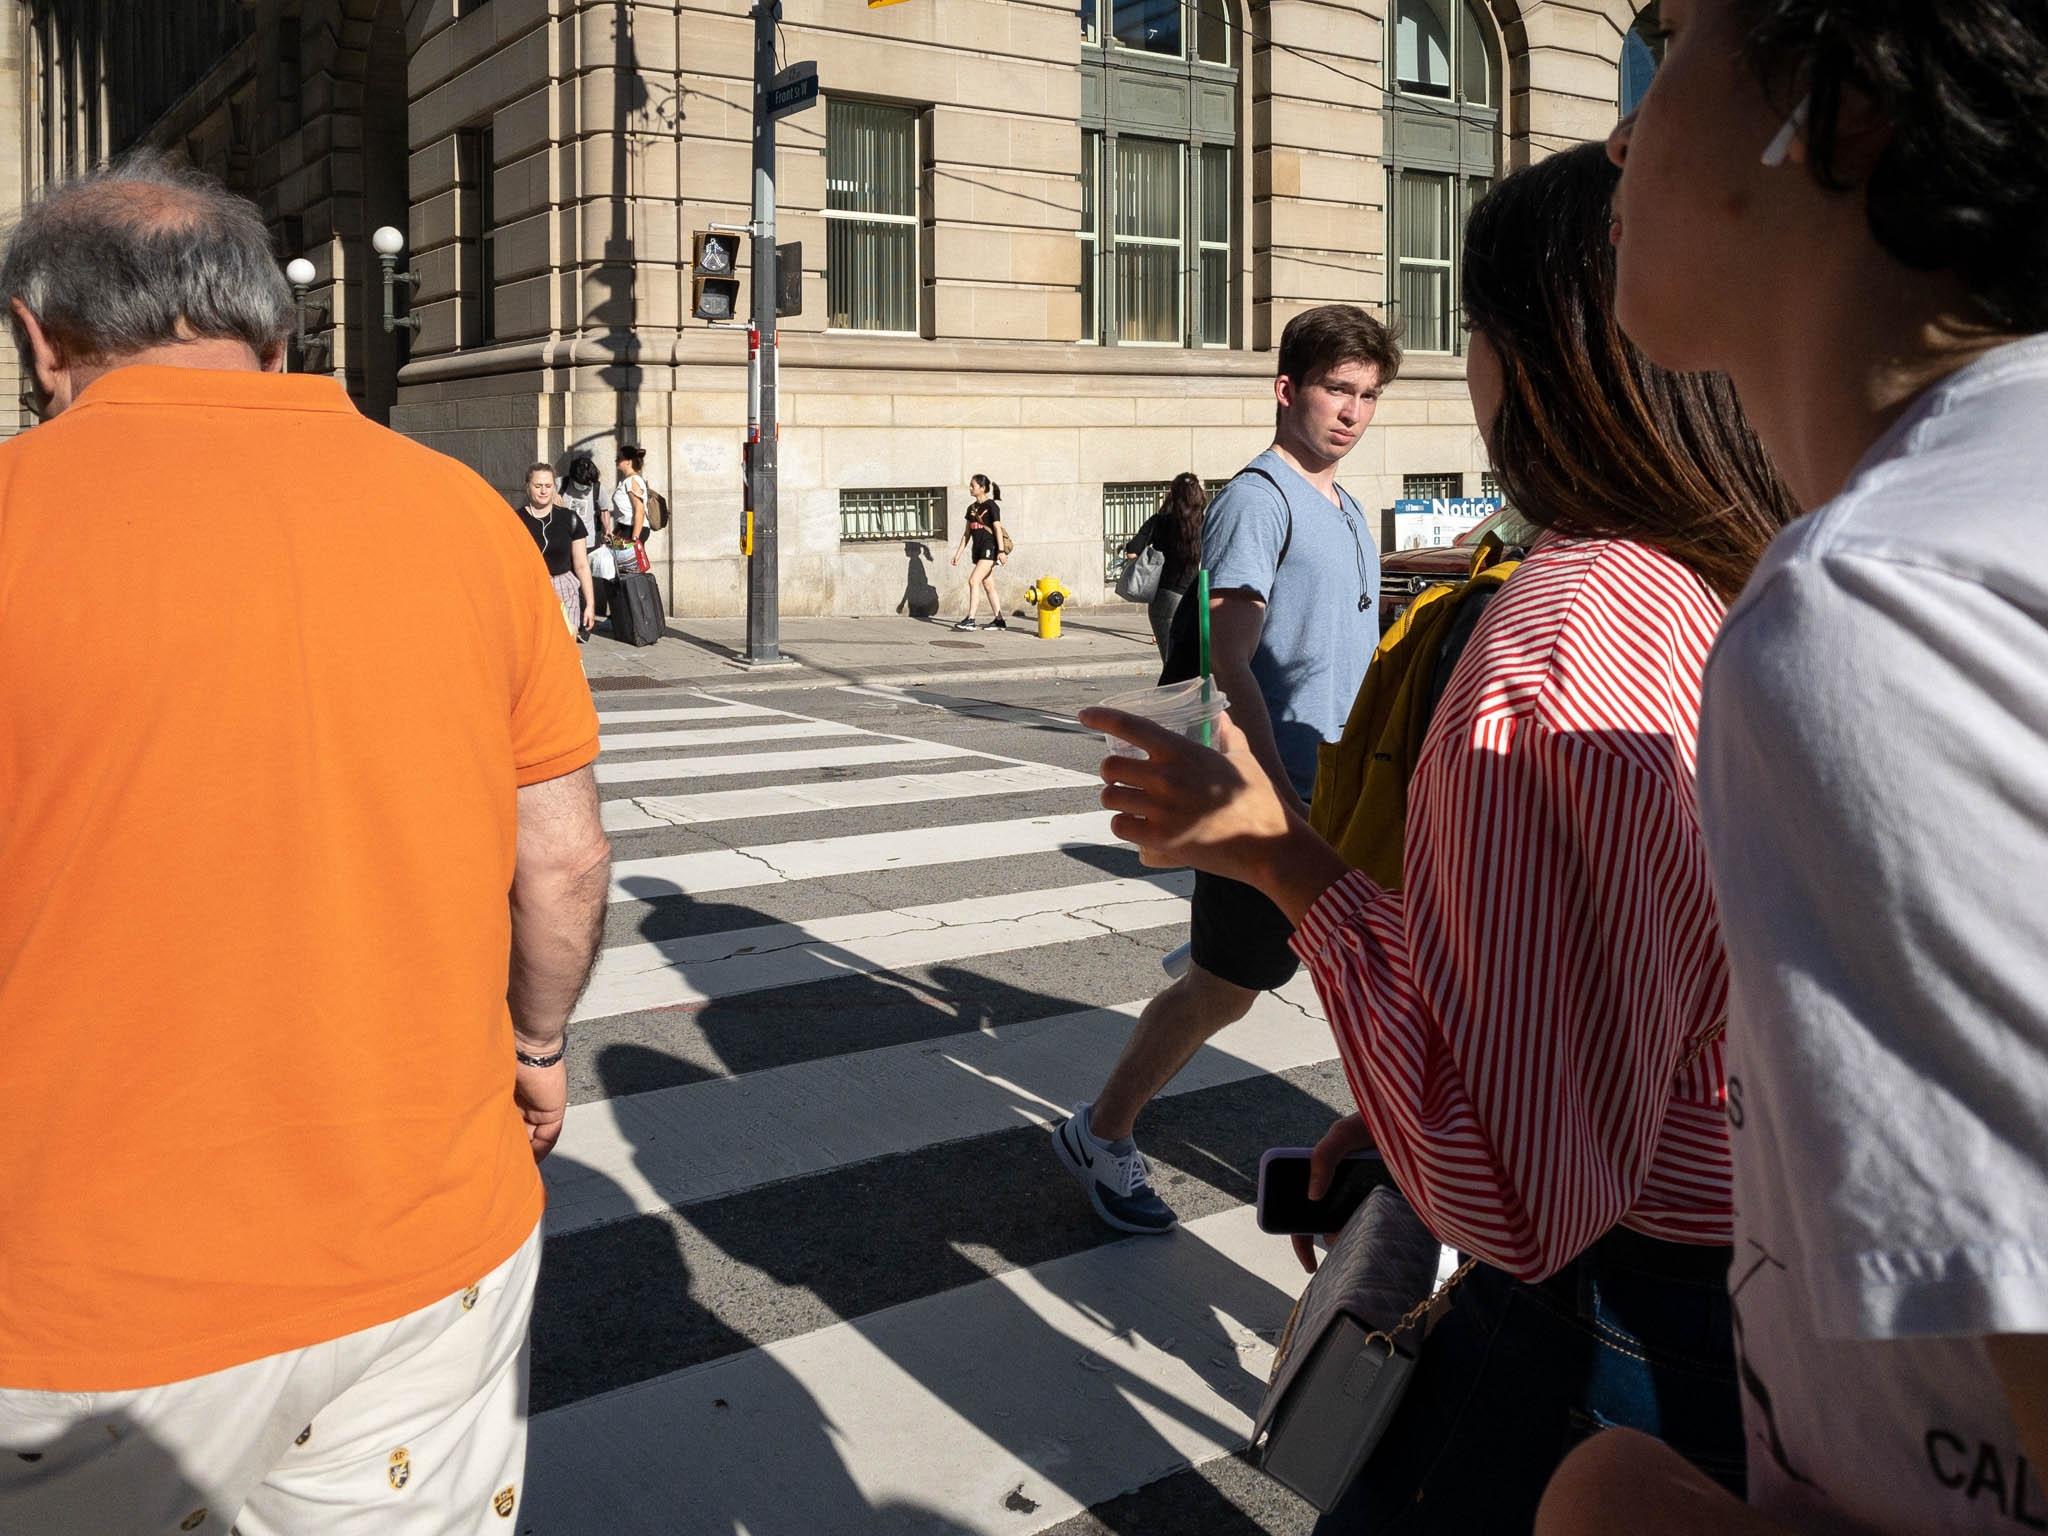 Toronto, August 2020 - streetphotography - karledwards | ello